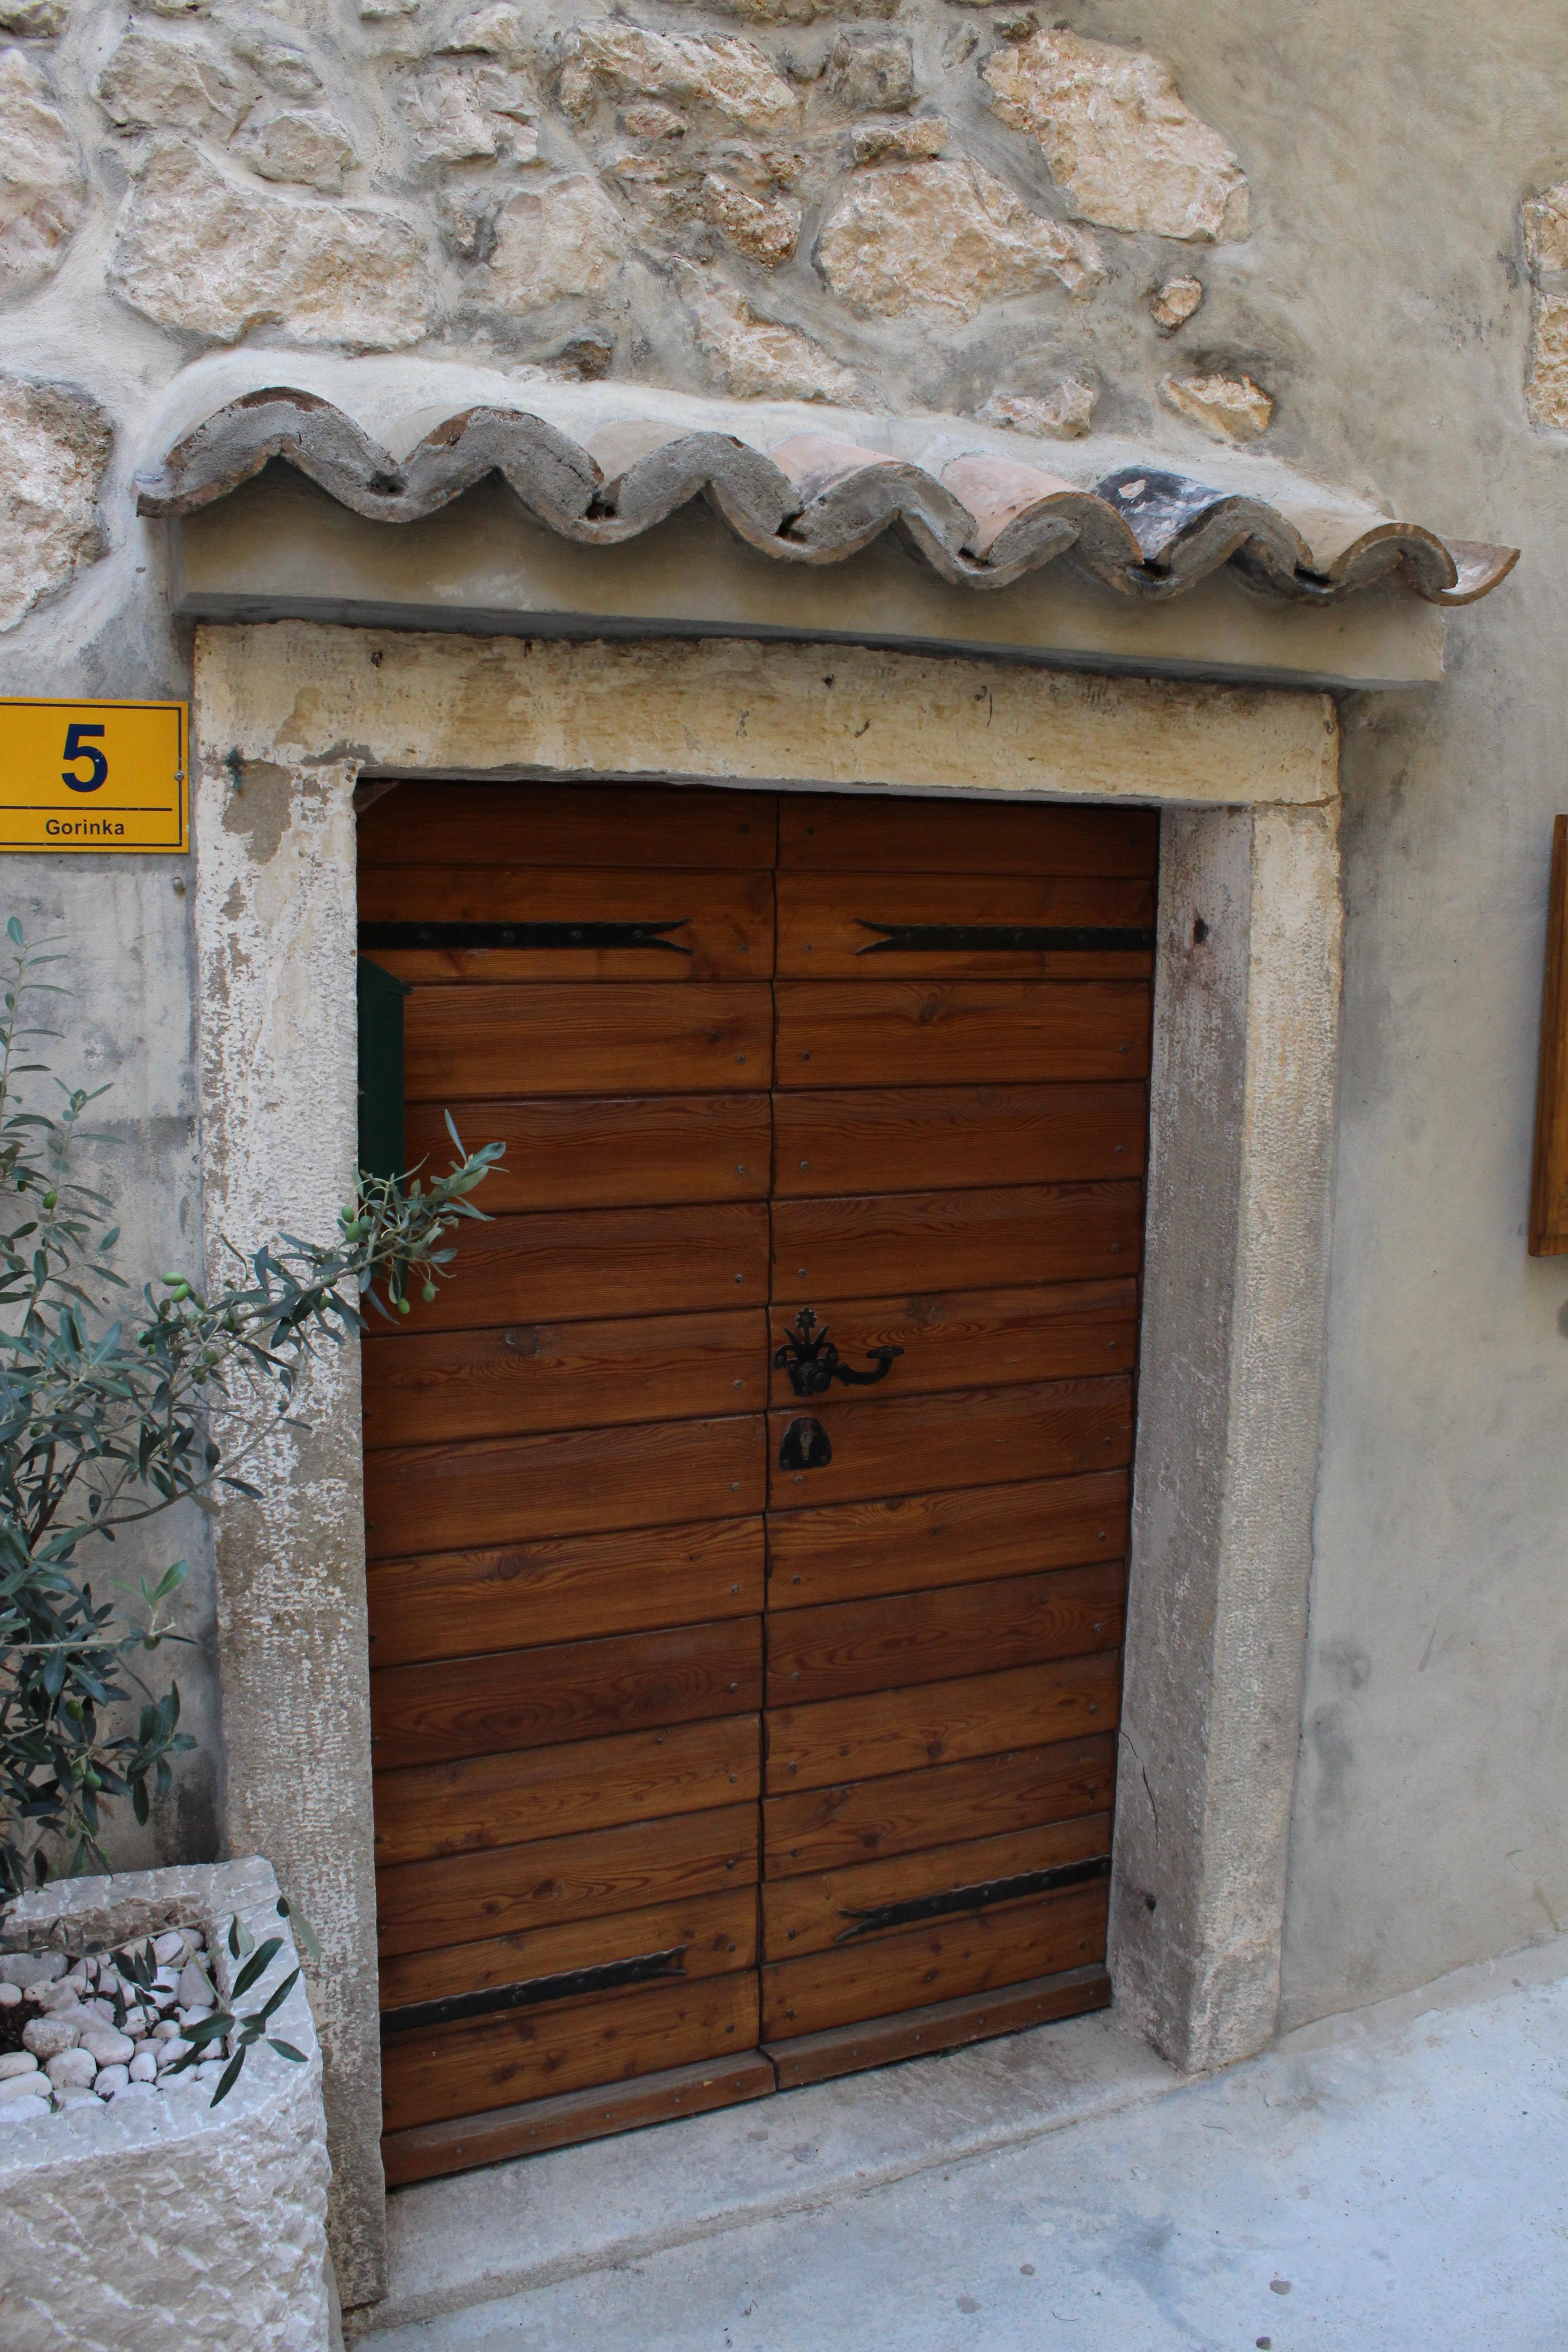 Fotos gratis madera ventana edificio fachada port n for Puertas de entrada principal